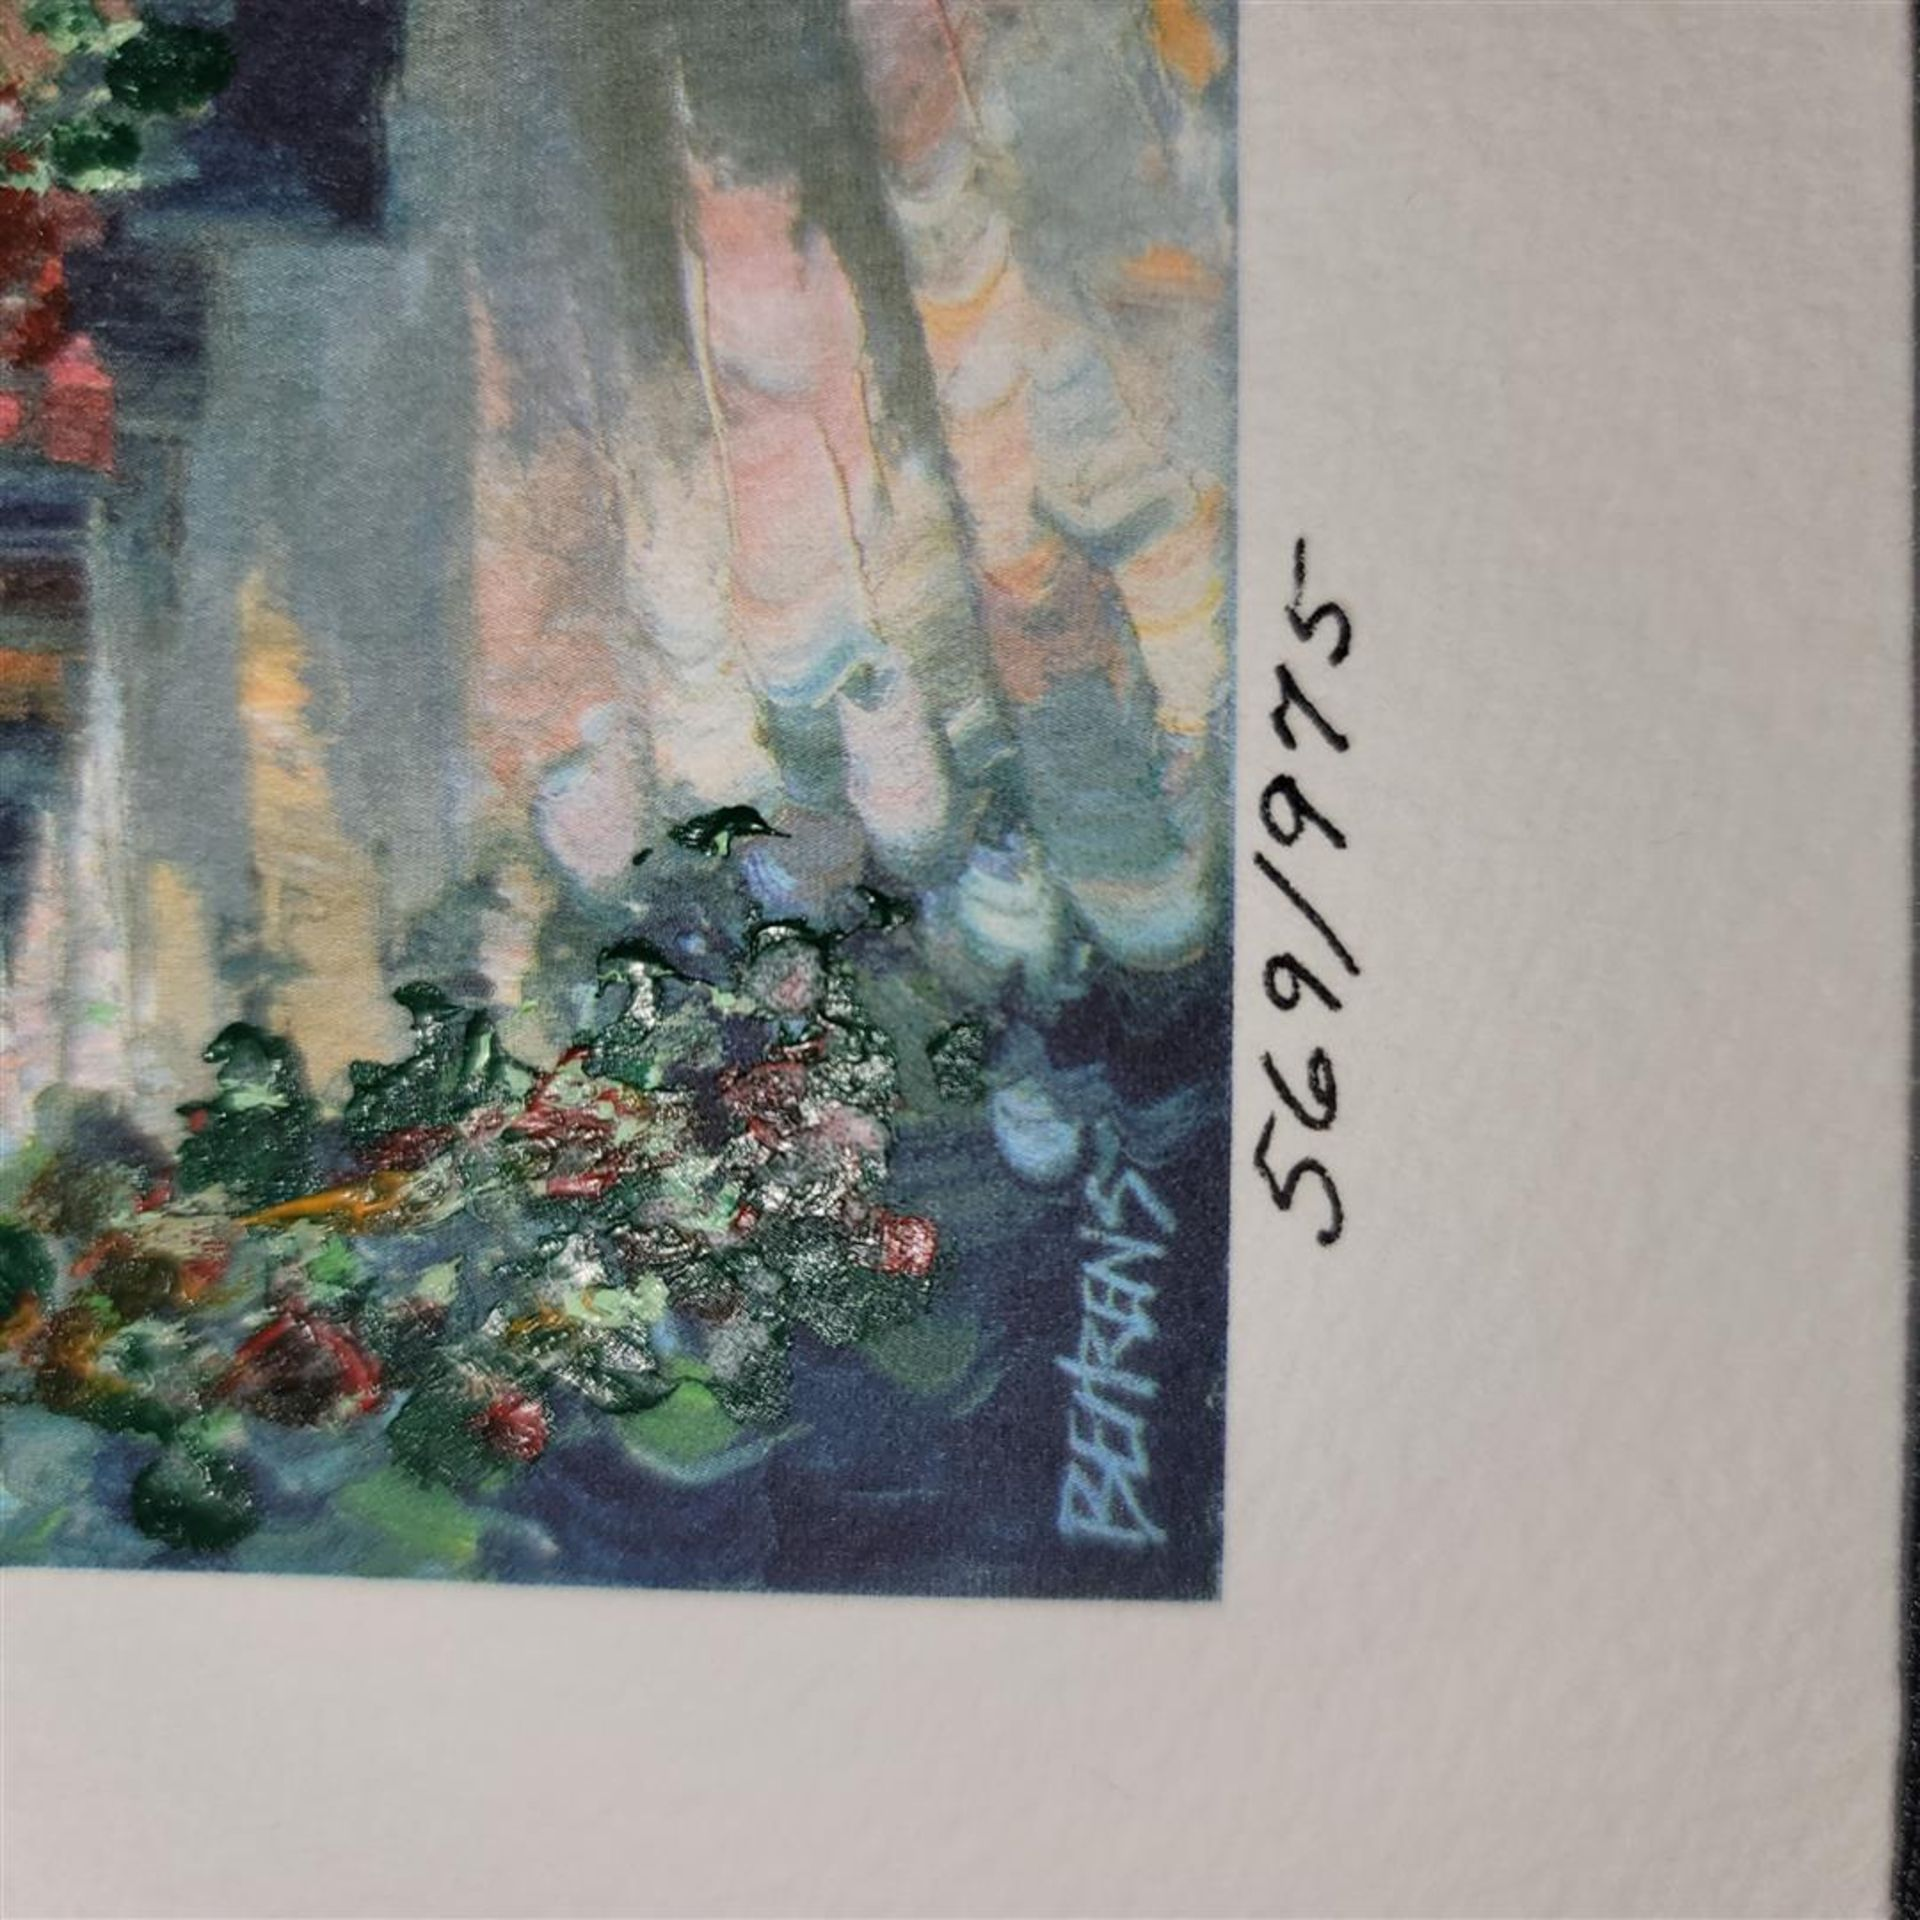 """Village Hideaway"" by Howard Behrens - Signed, Numbered, & Embellished - Image 3 of 4"